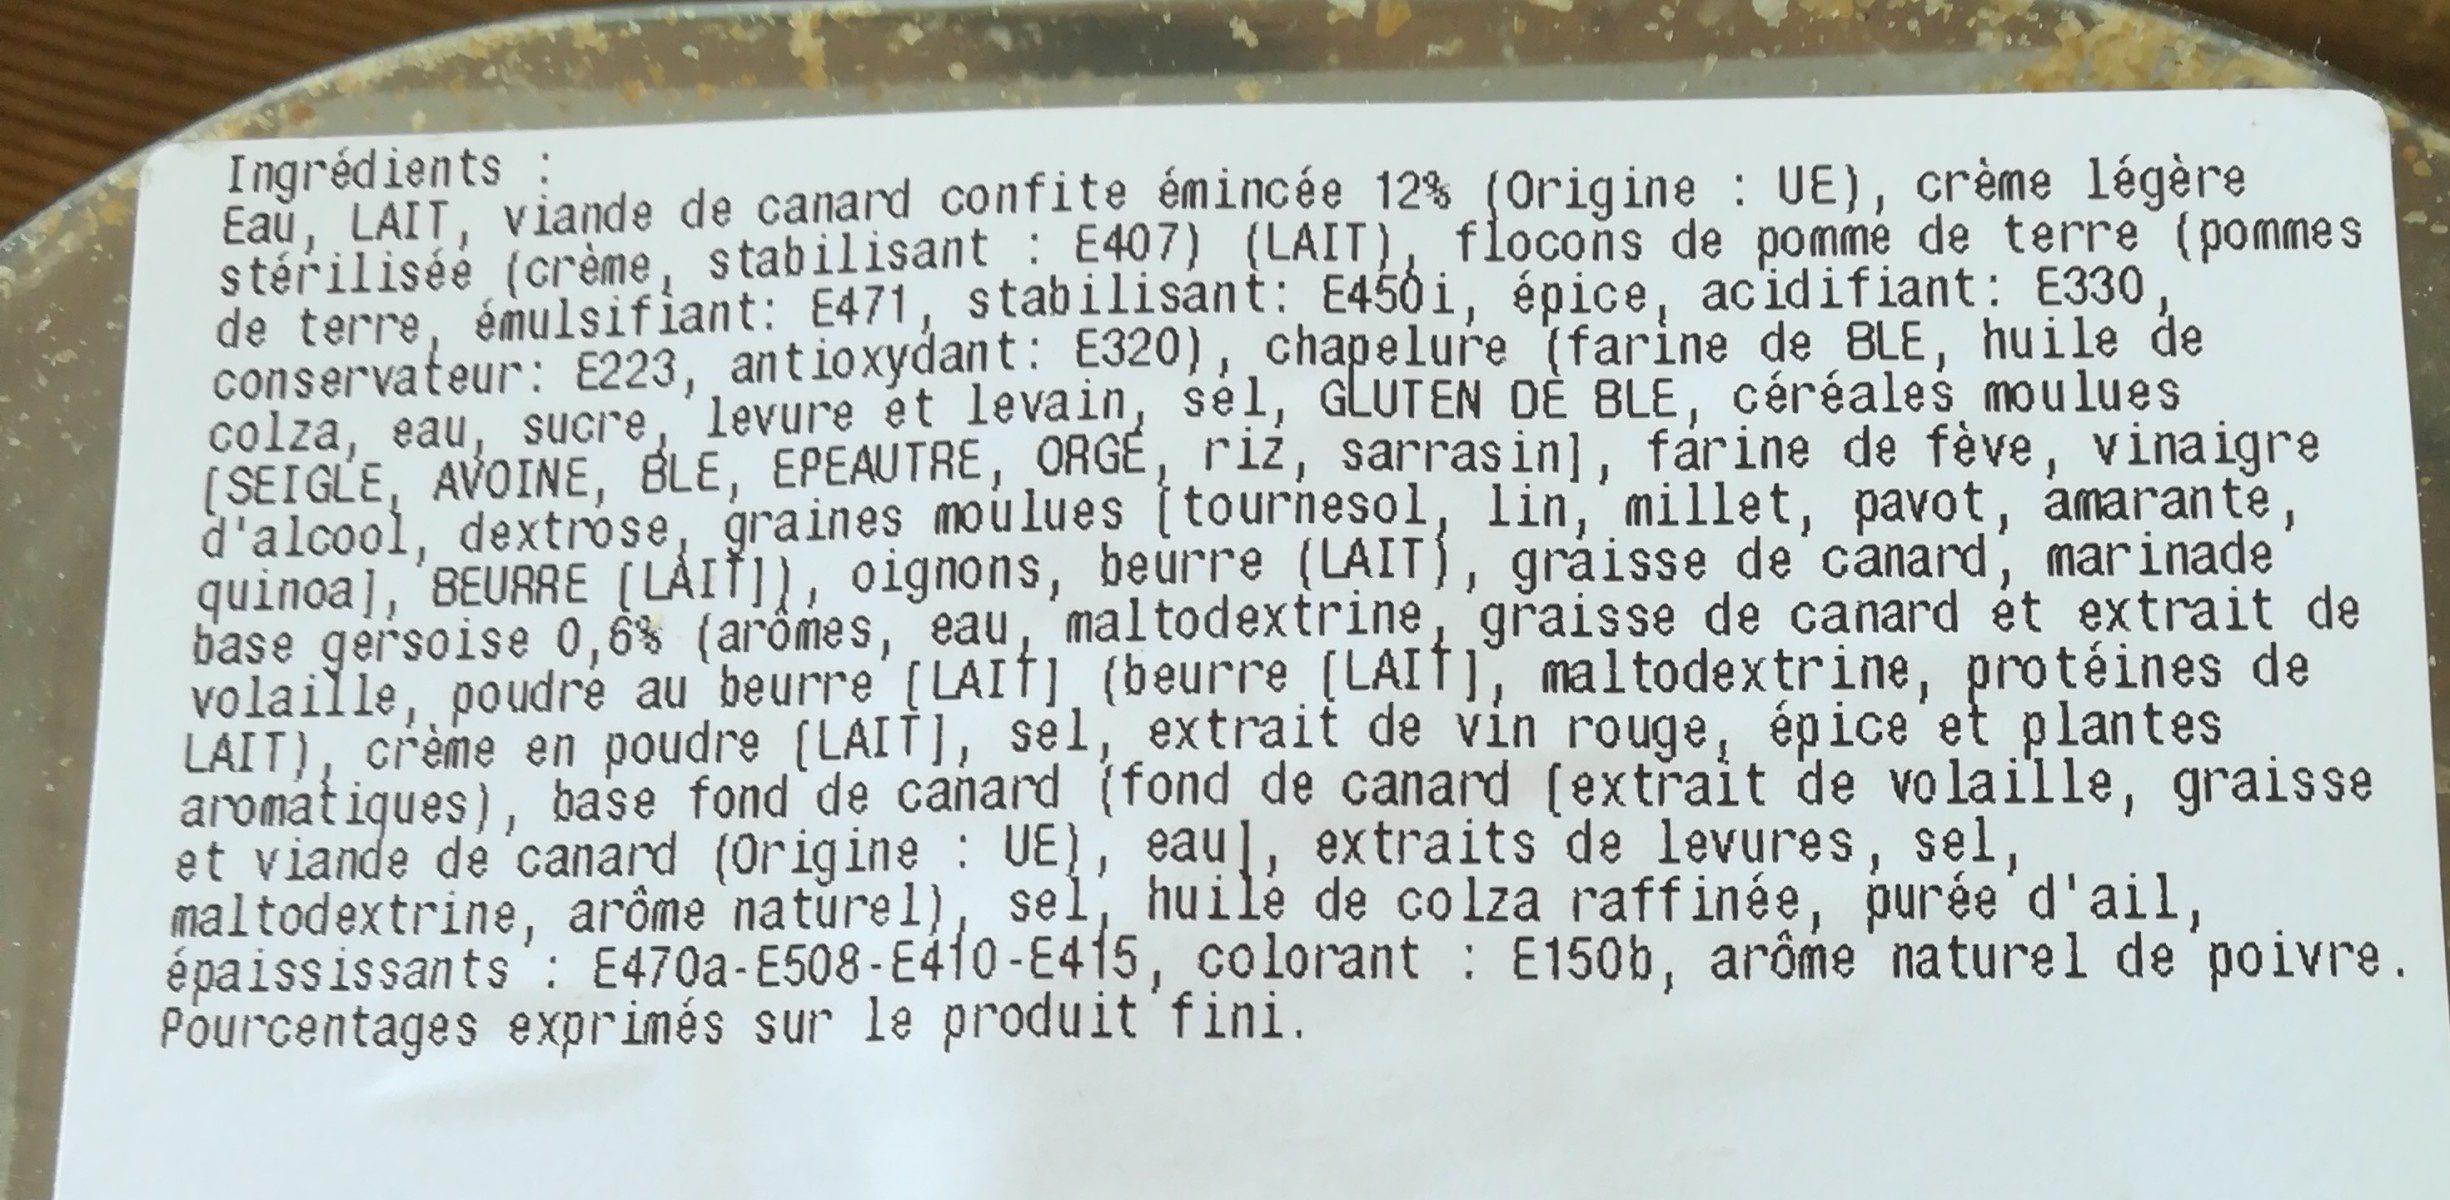 Parmentier de canard - Ingrediënten - fr